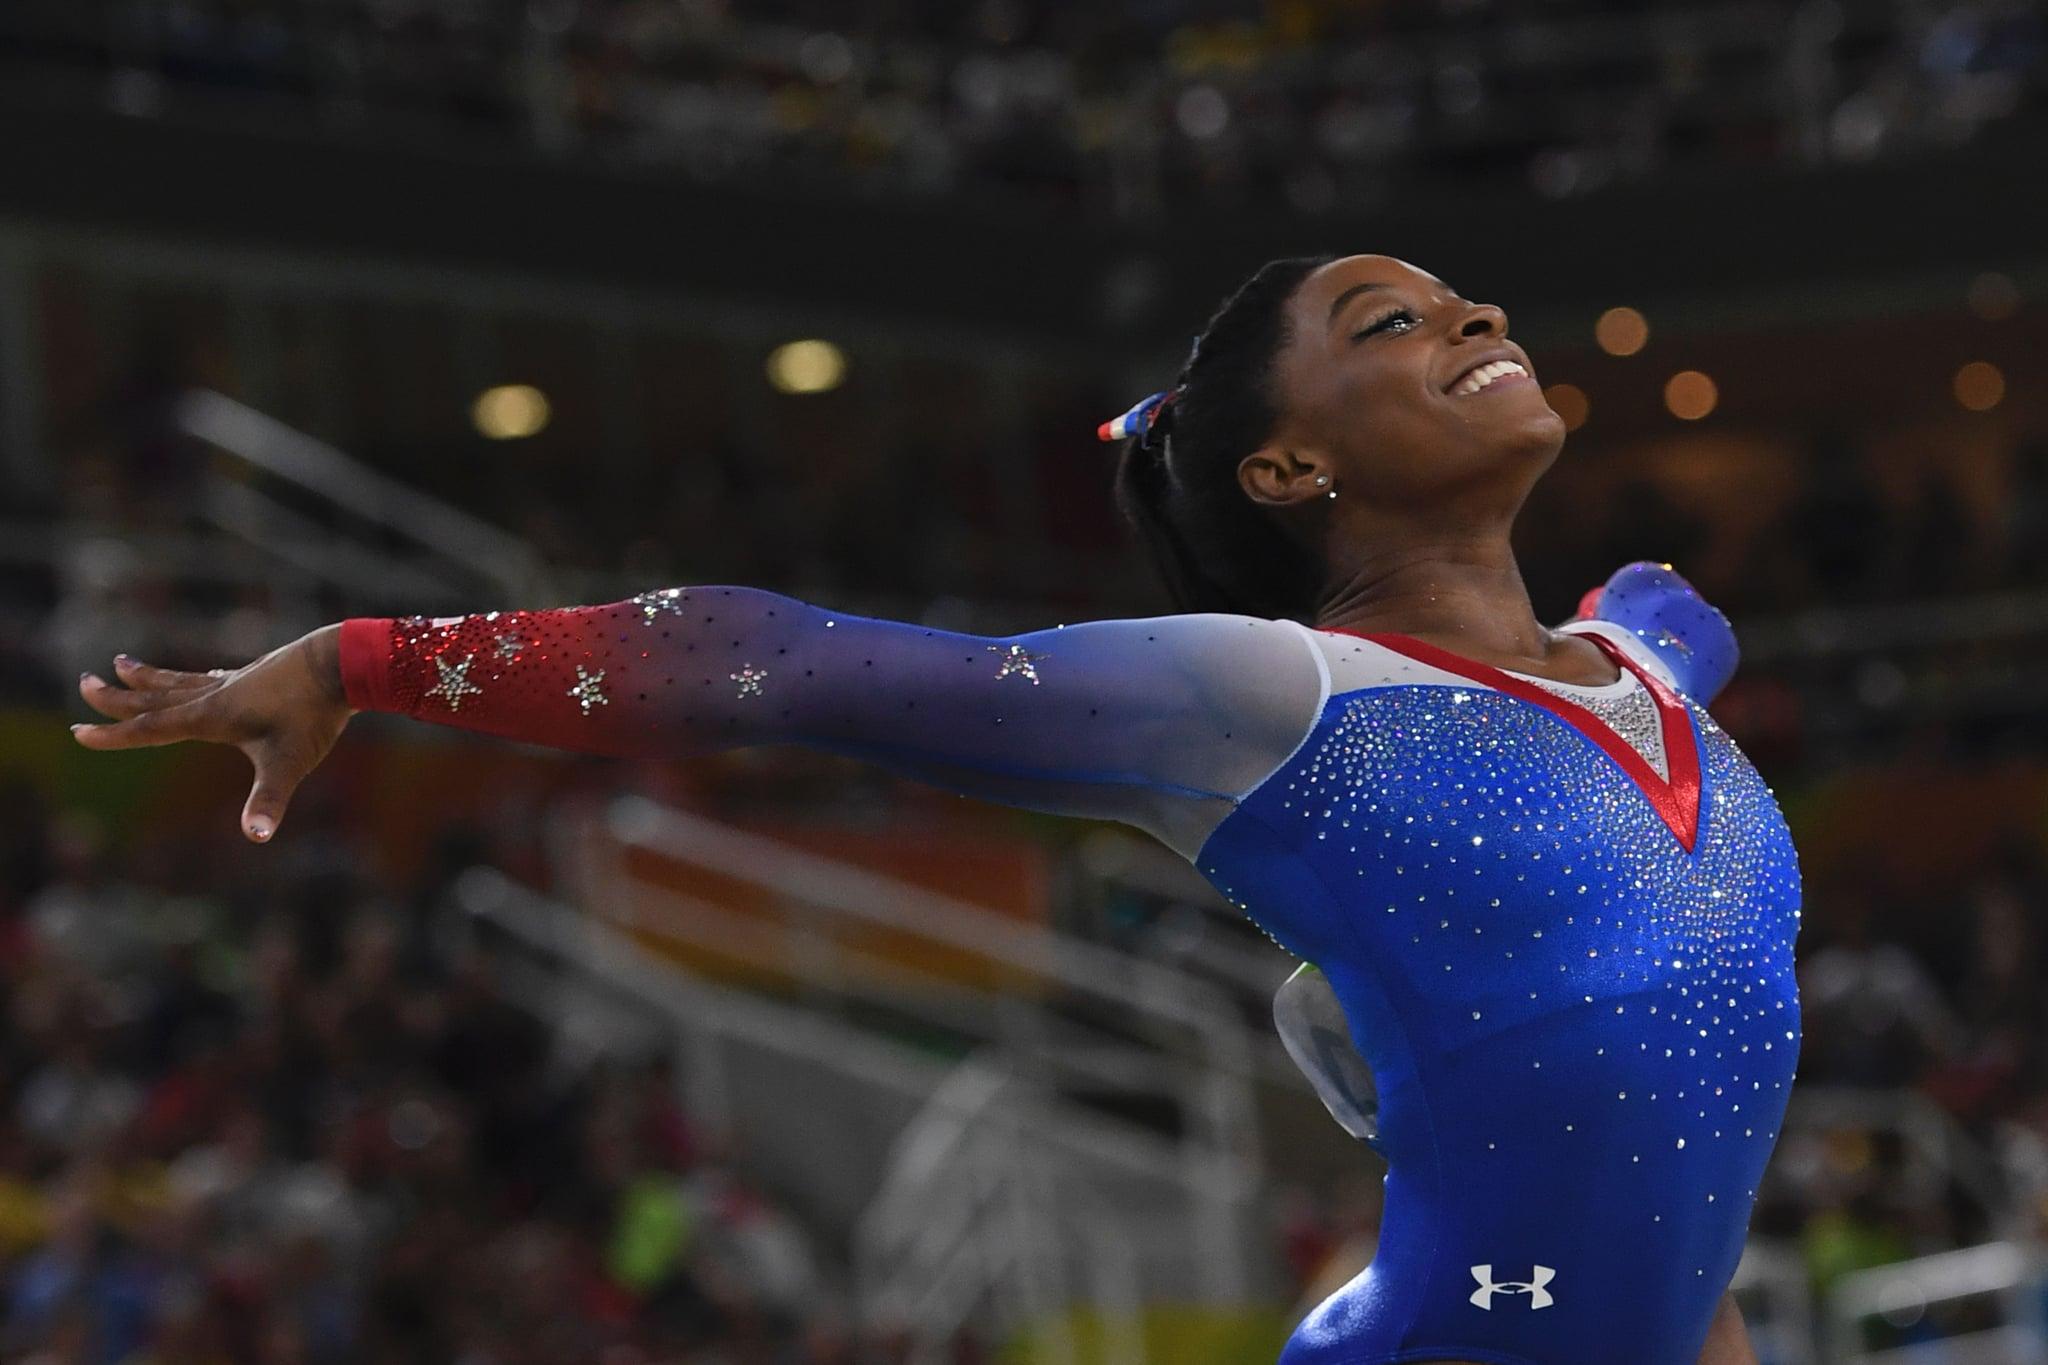 Simone Biles Interview From Rio Olympics